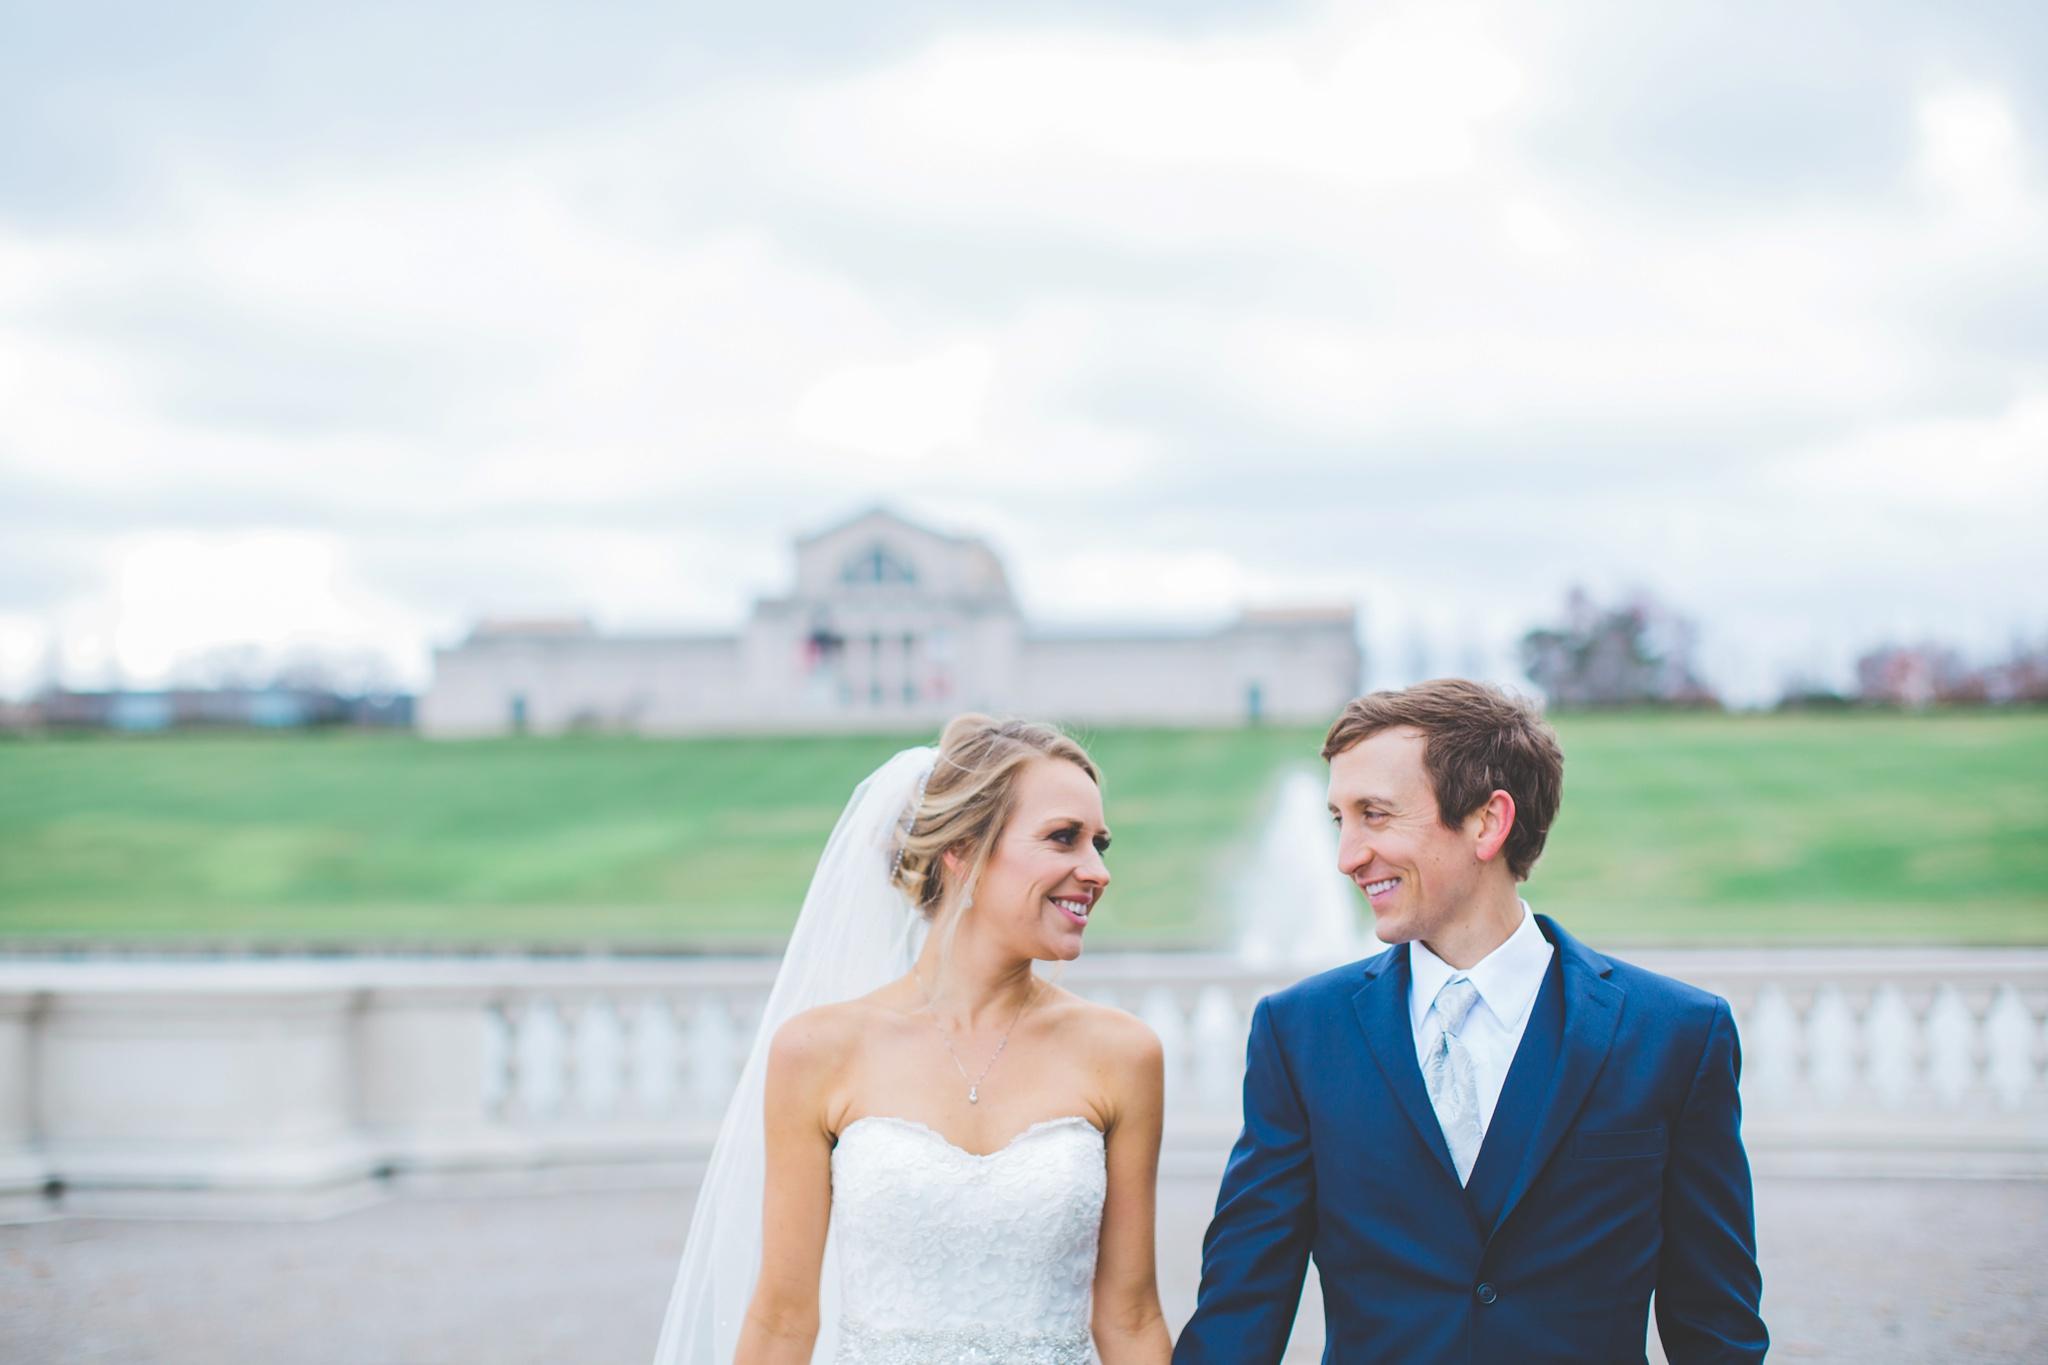 St. Louis Wedding Photographer   Chandler Rose Photography_0029.jpg